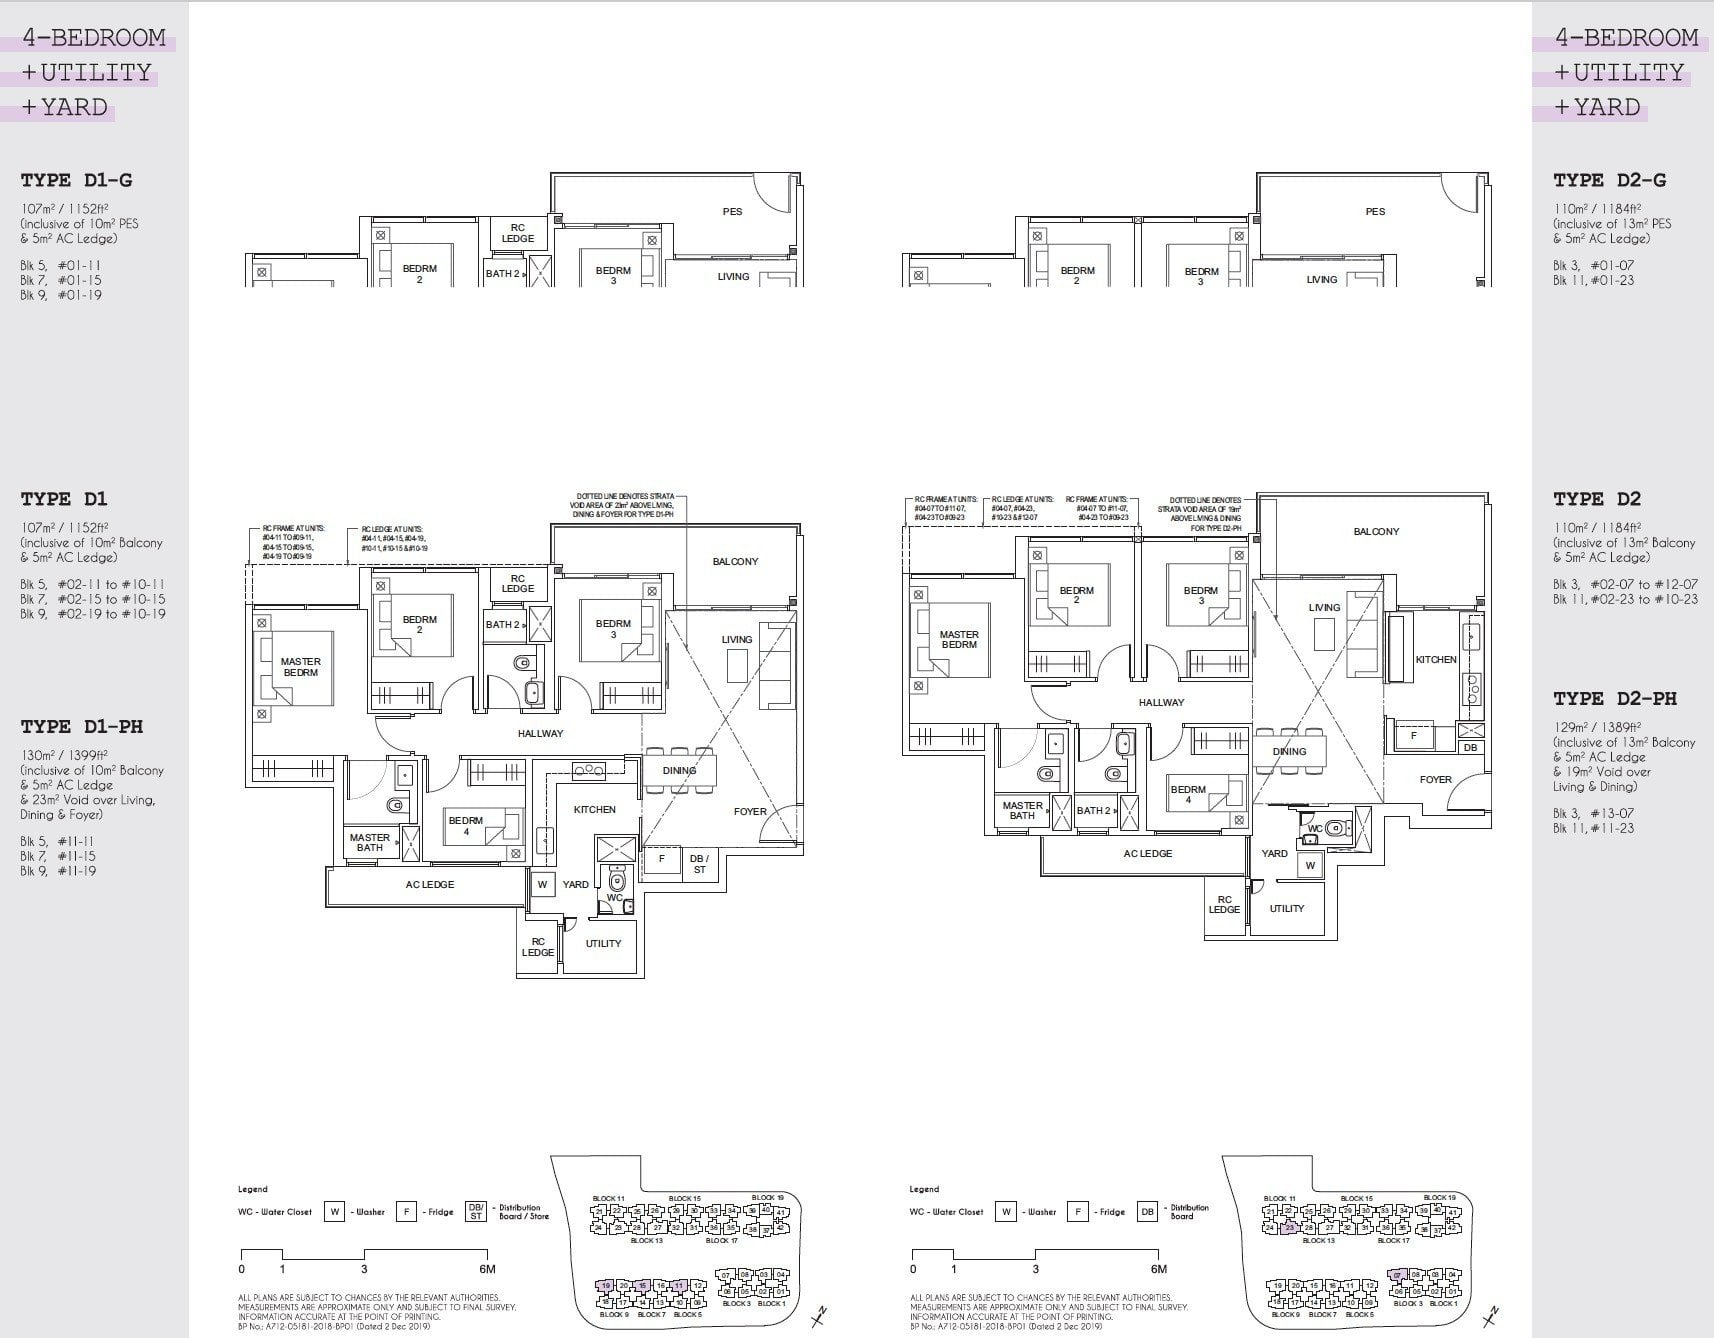 Parc Canberra floor plan floor plan 4BR-1